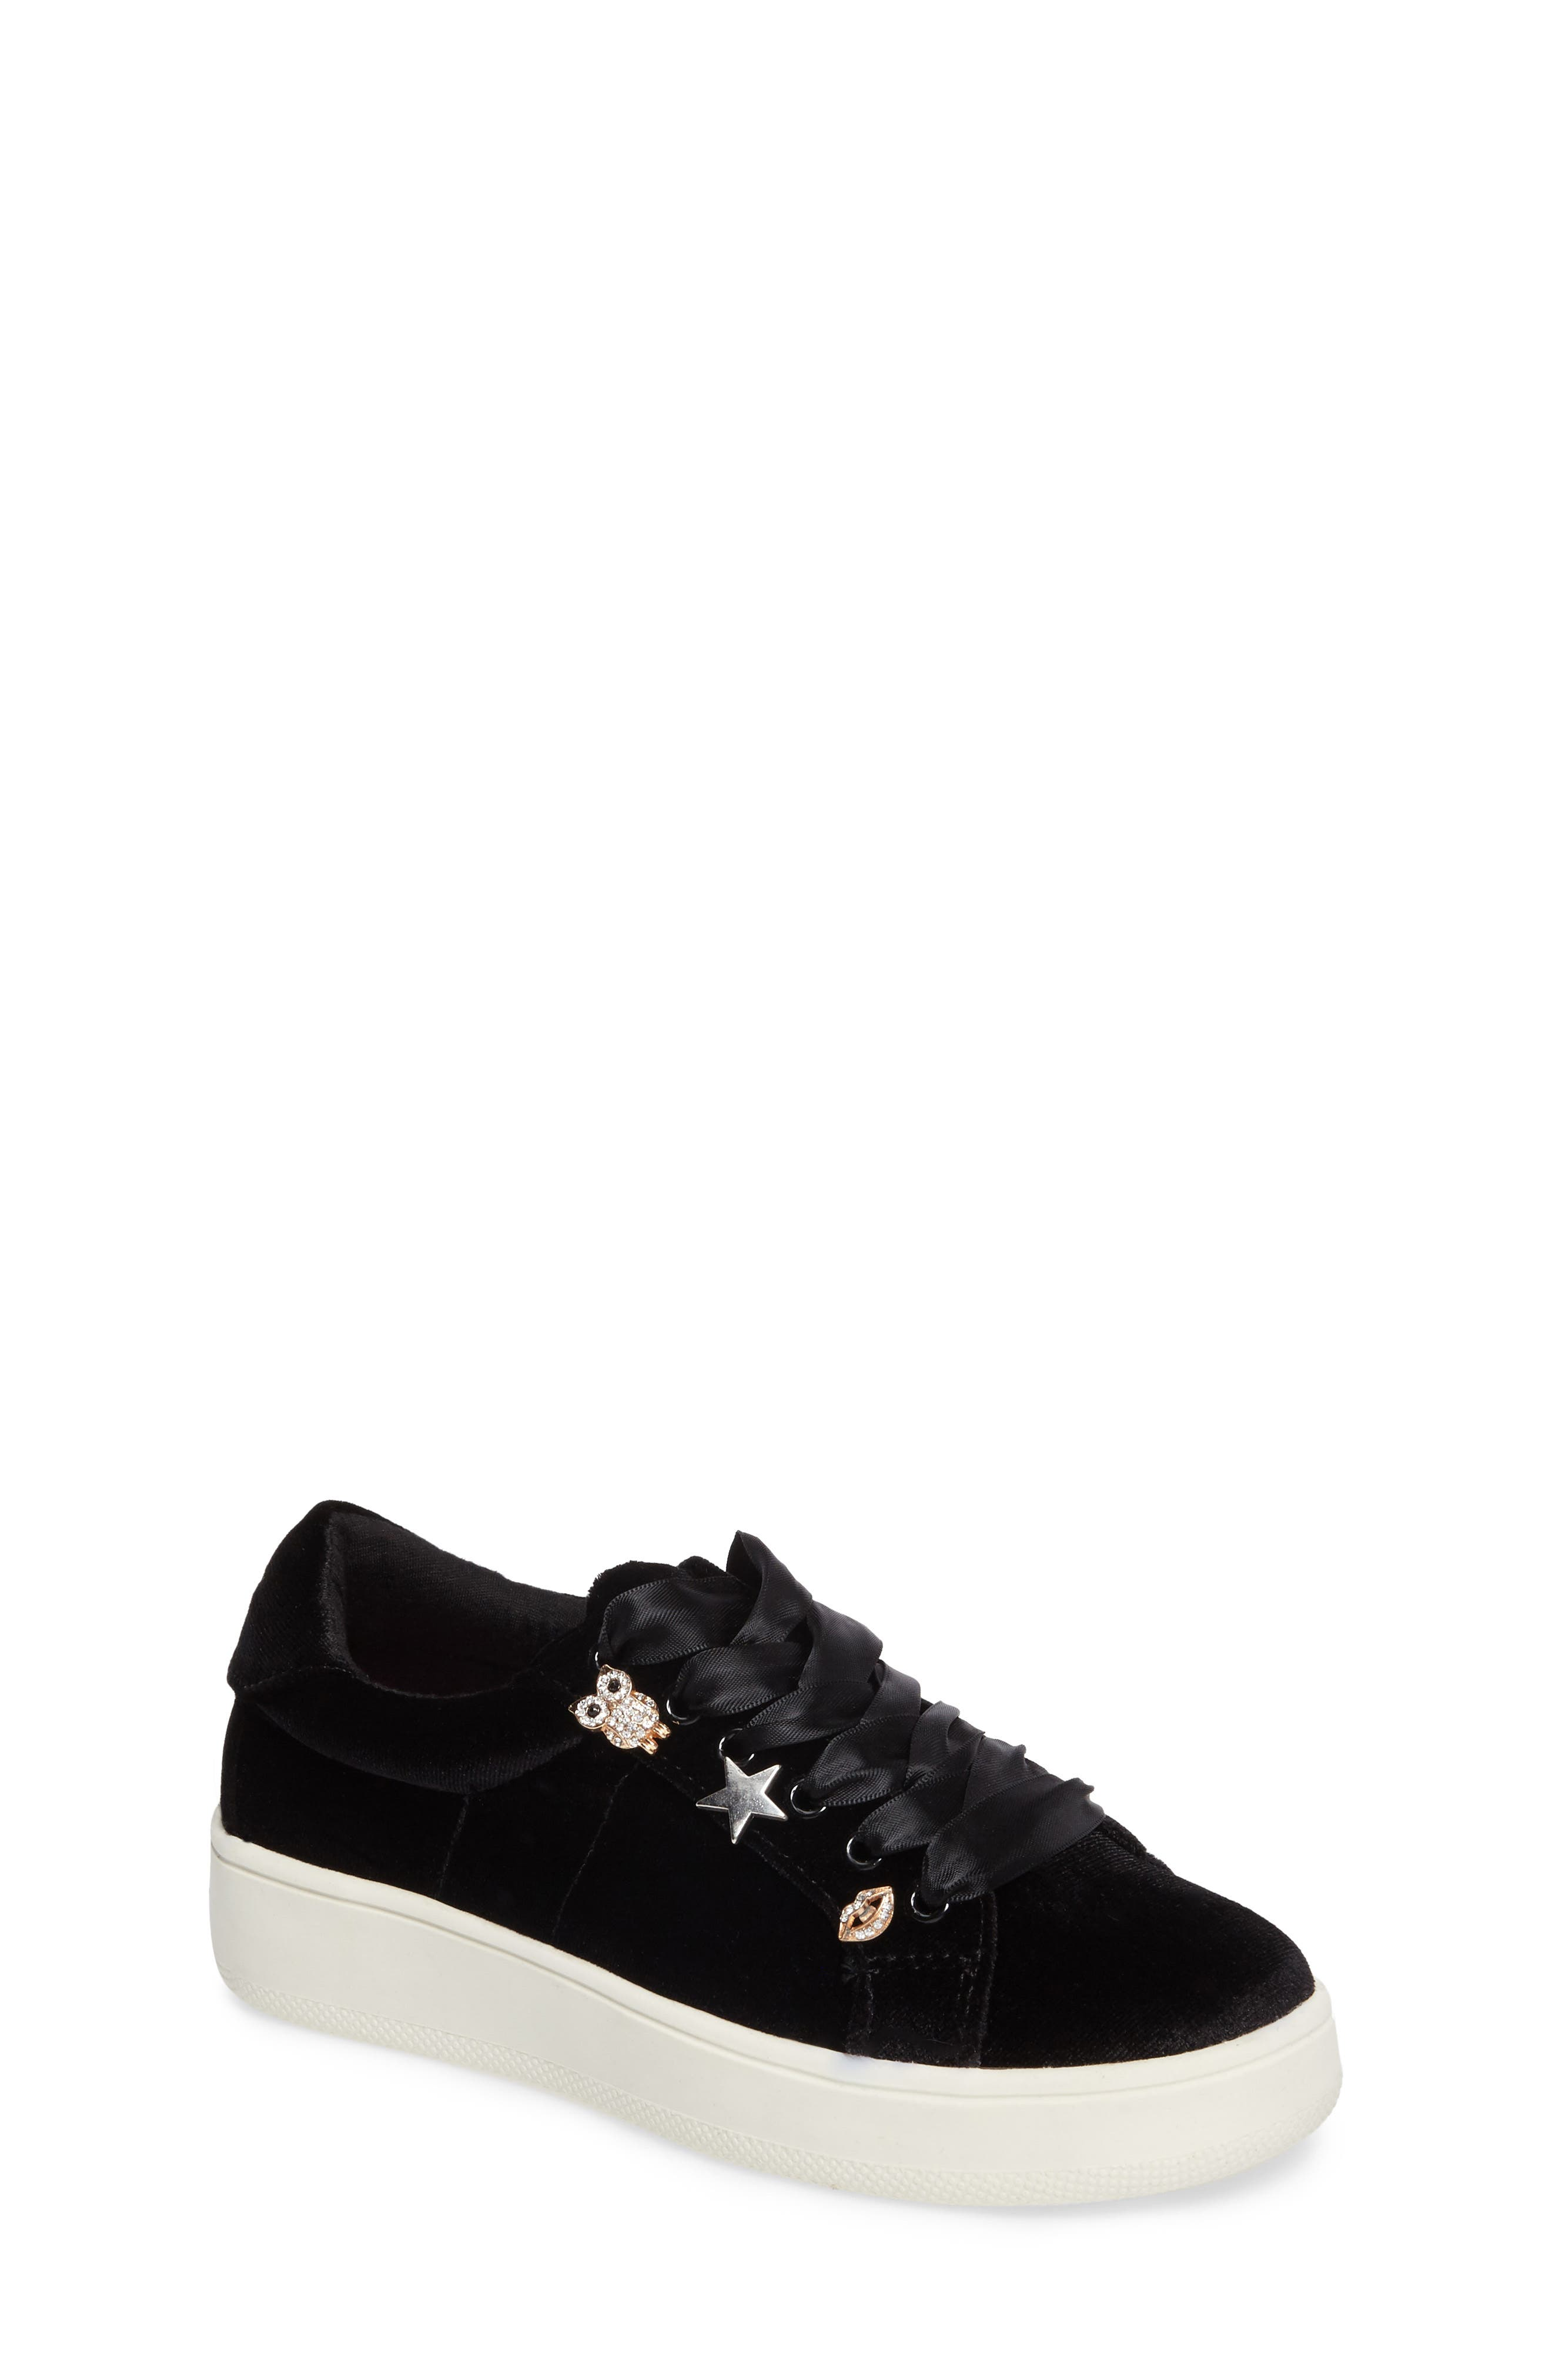 Jbertiec Charm Sneaker,                         Main,                         color, 009